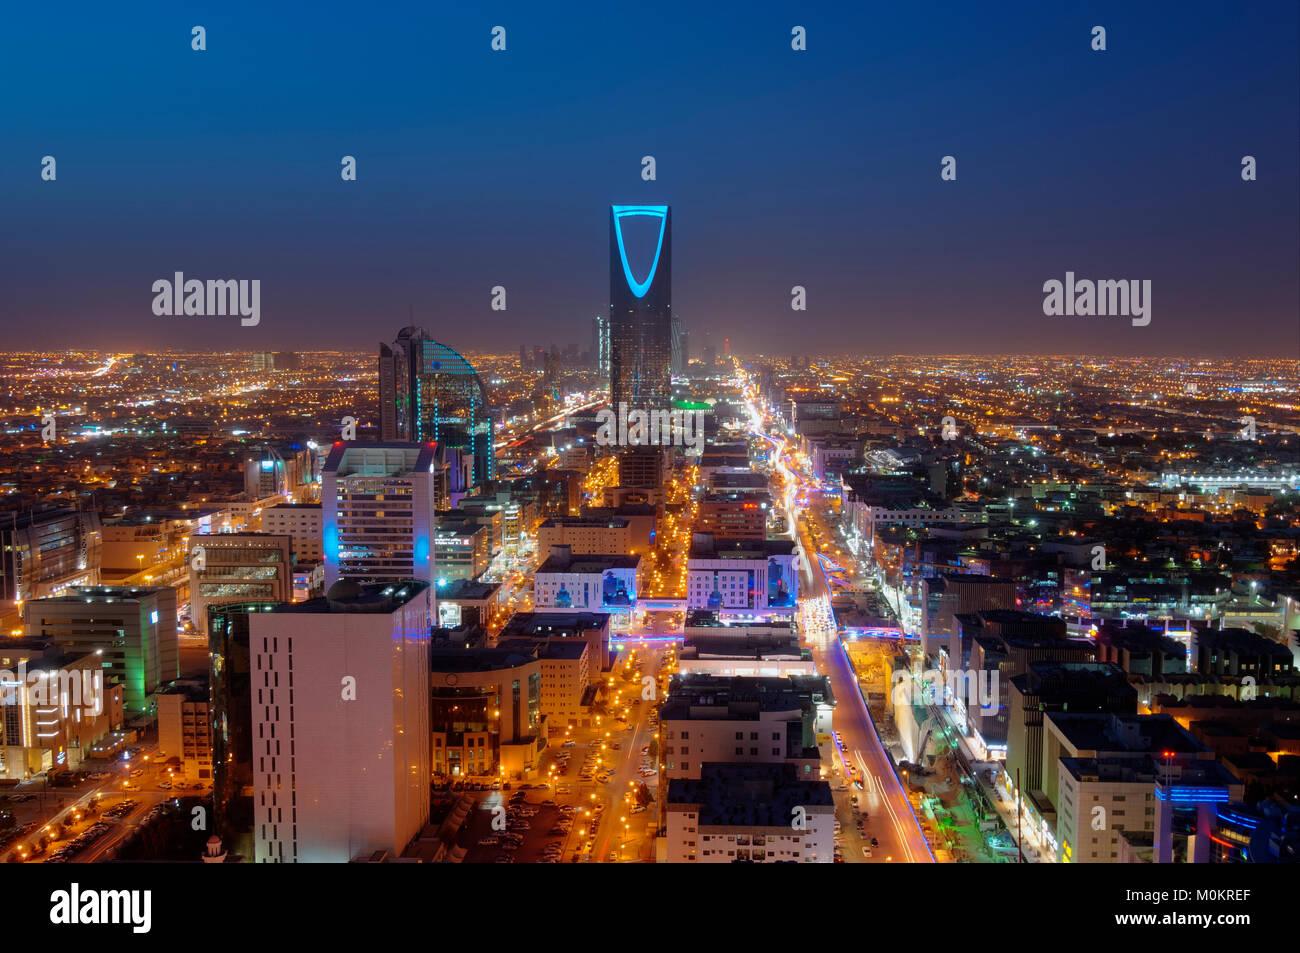 Riyadh skyline at night #2 - Stock Image